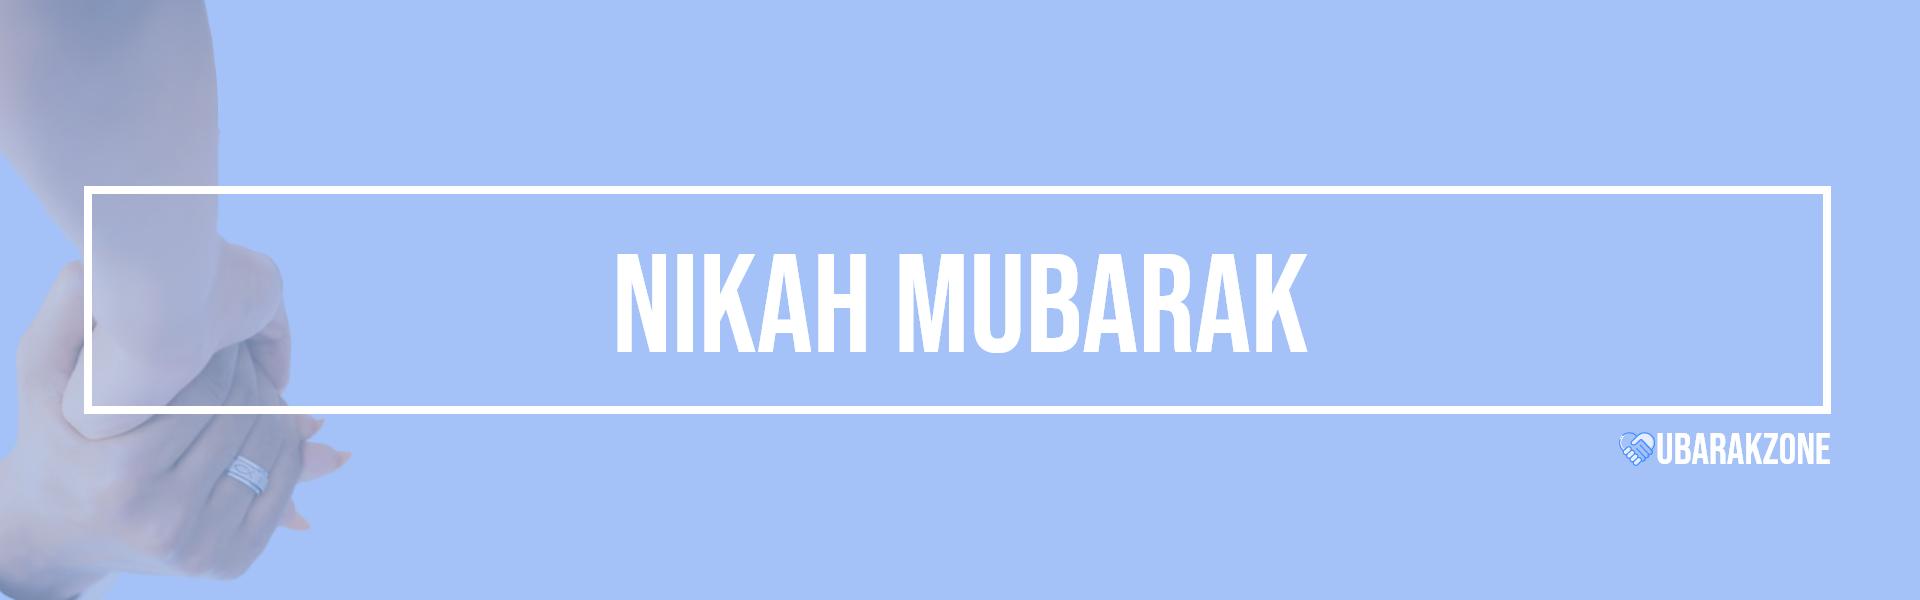 nikah mubarak wishes messages